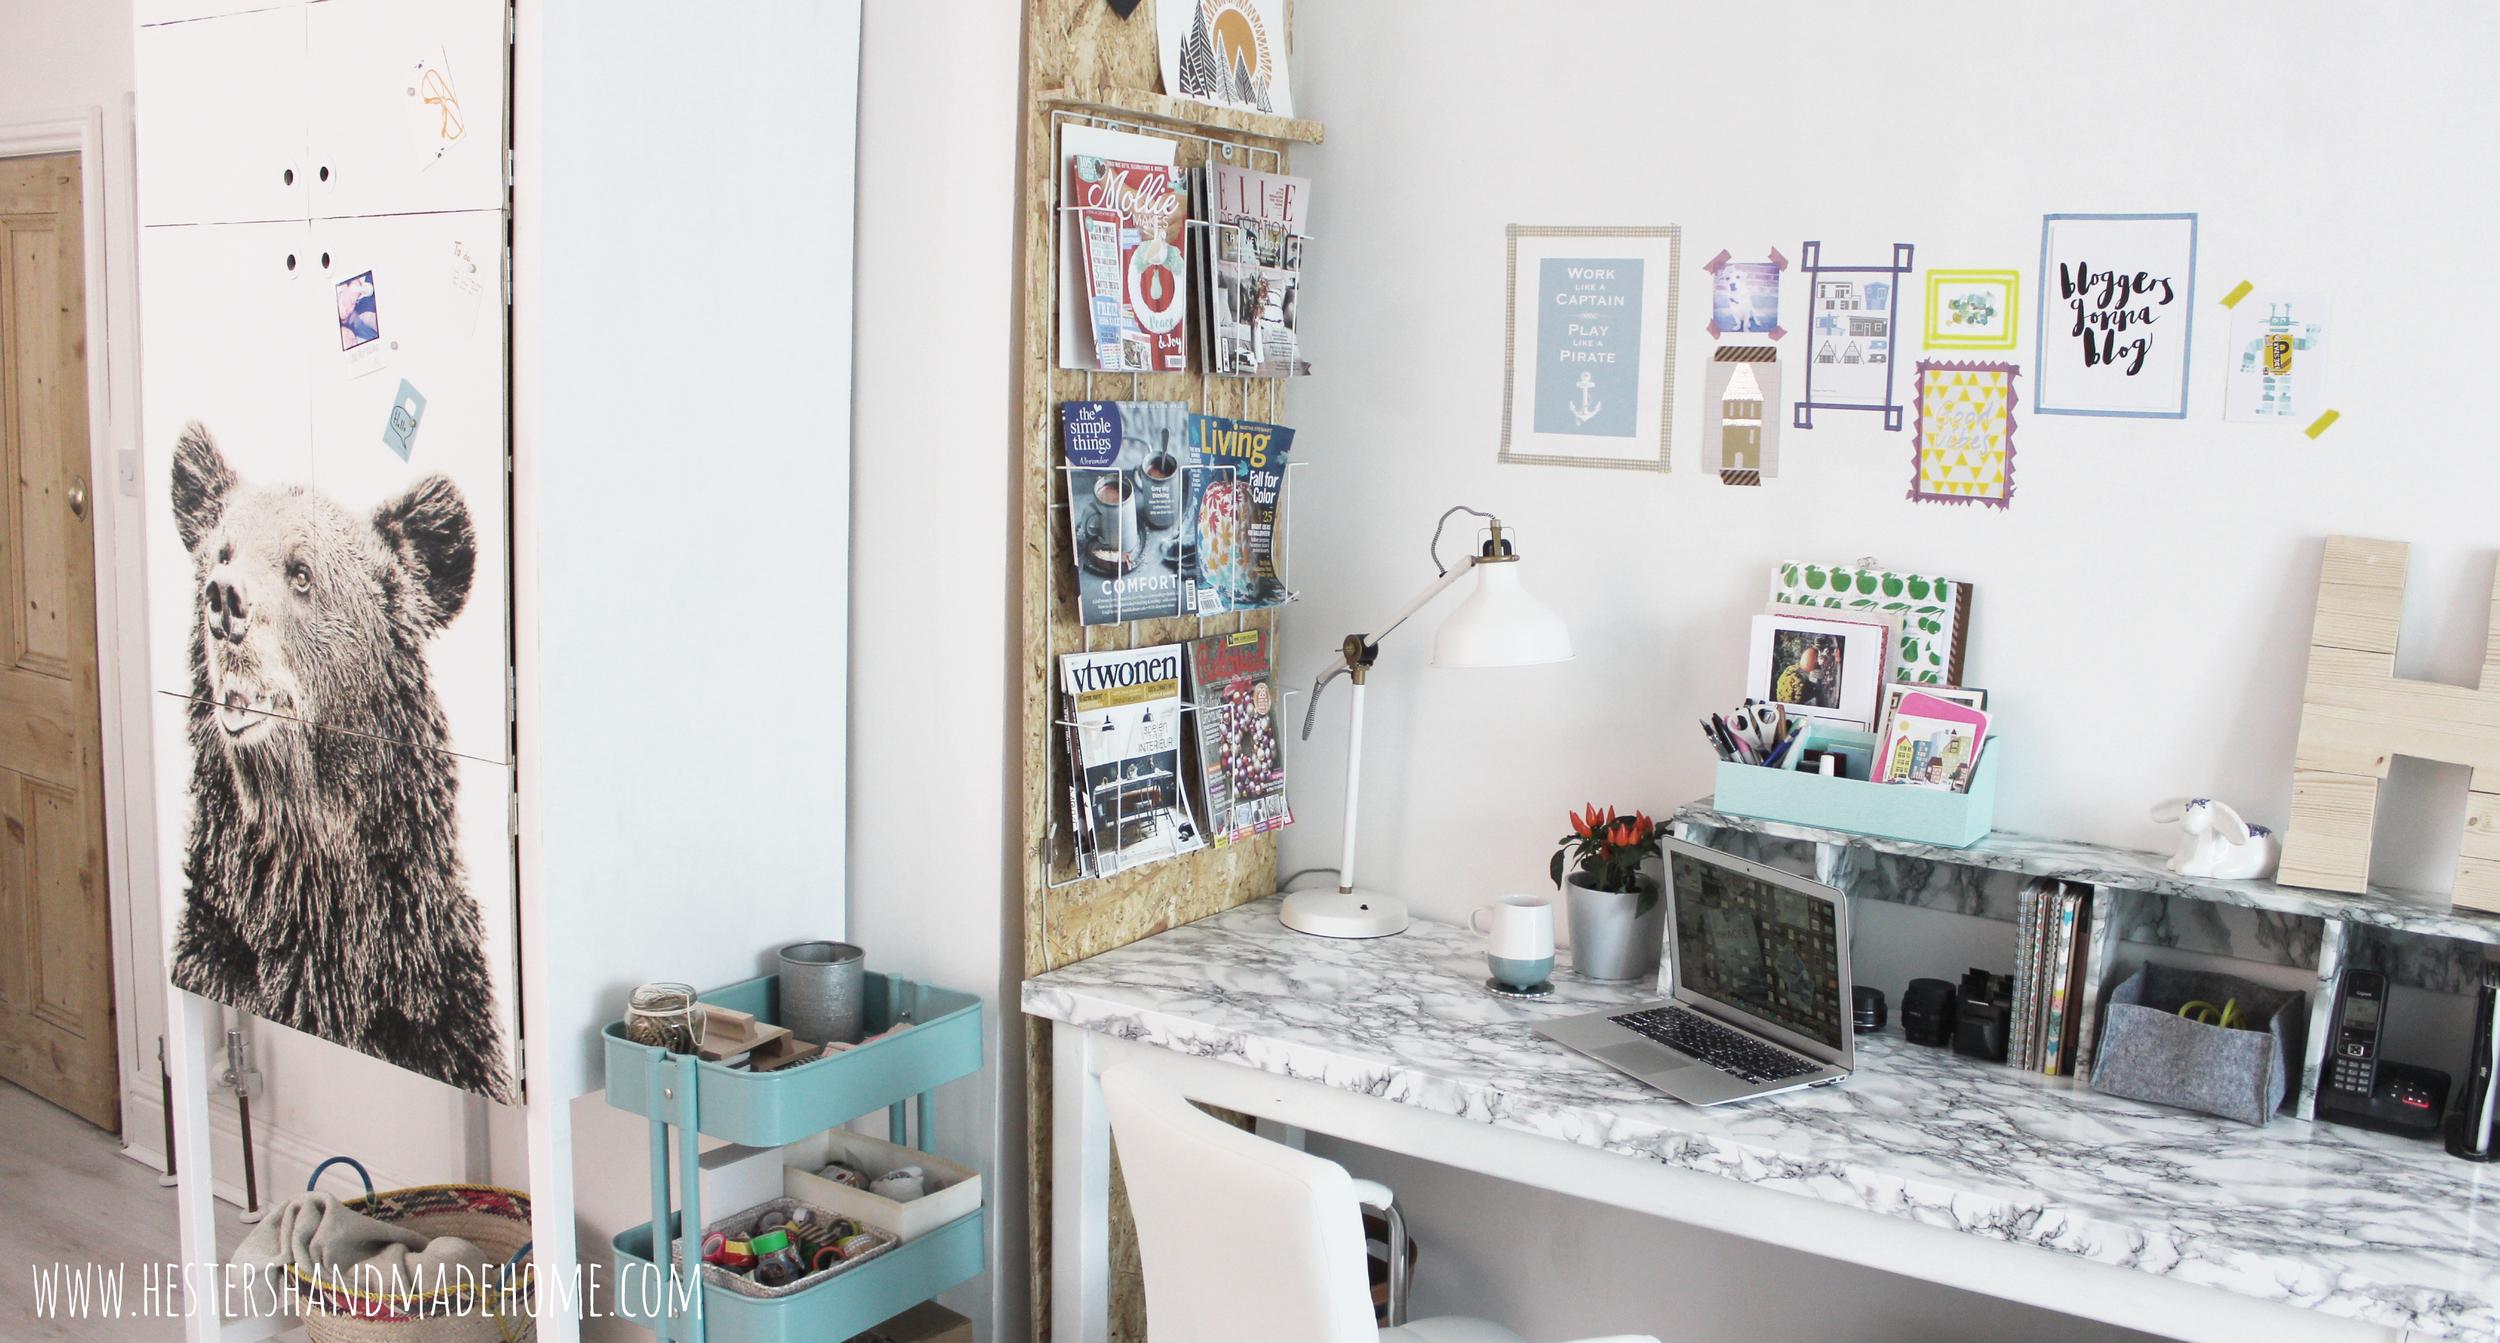 hesters handmade home office